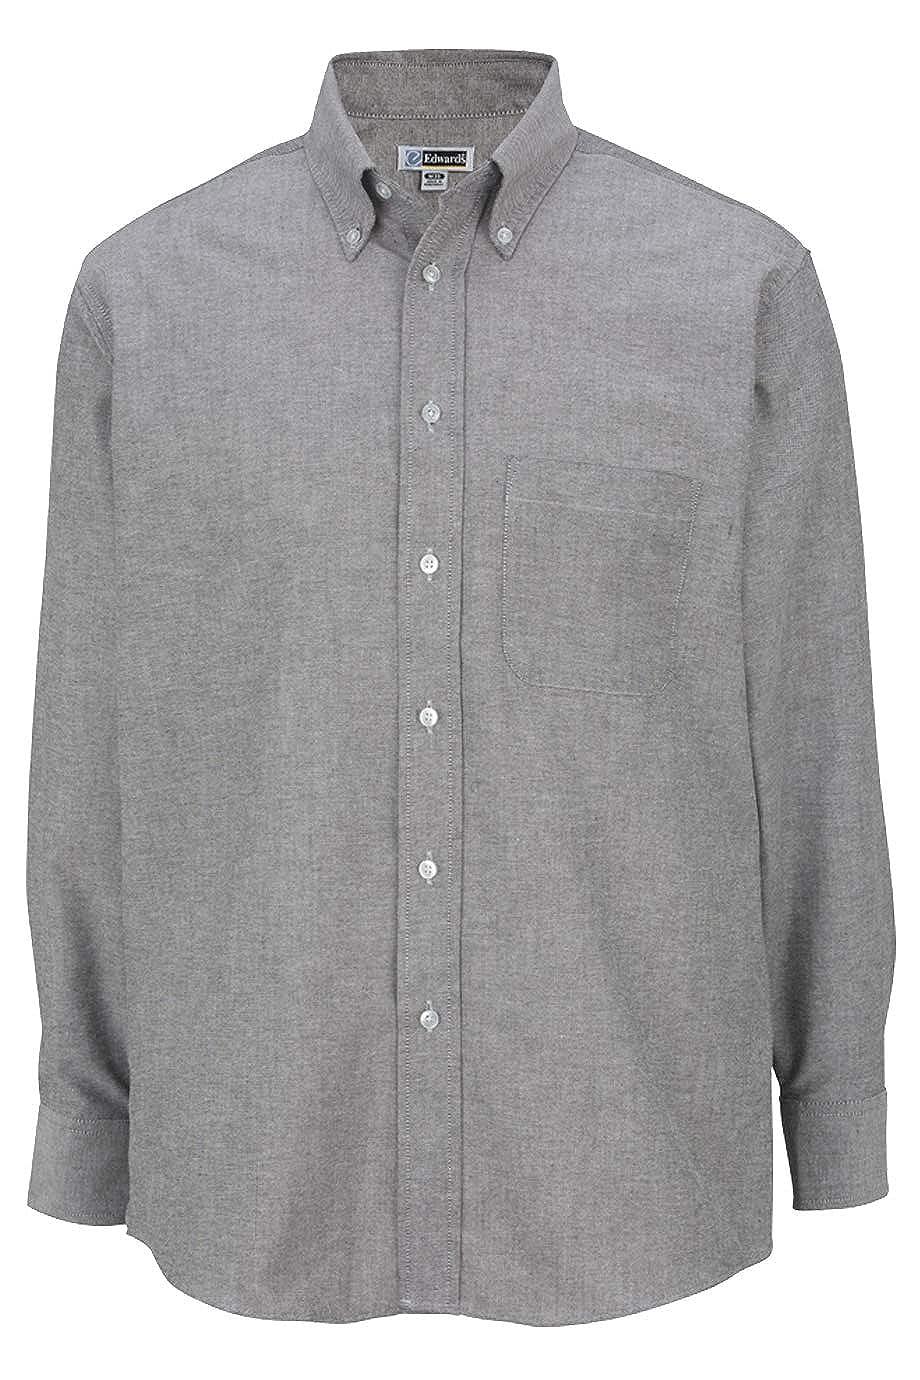 Edwards Mens Long Sleeve Oxford Shirt